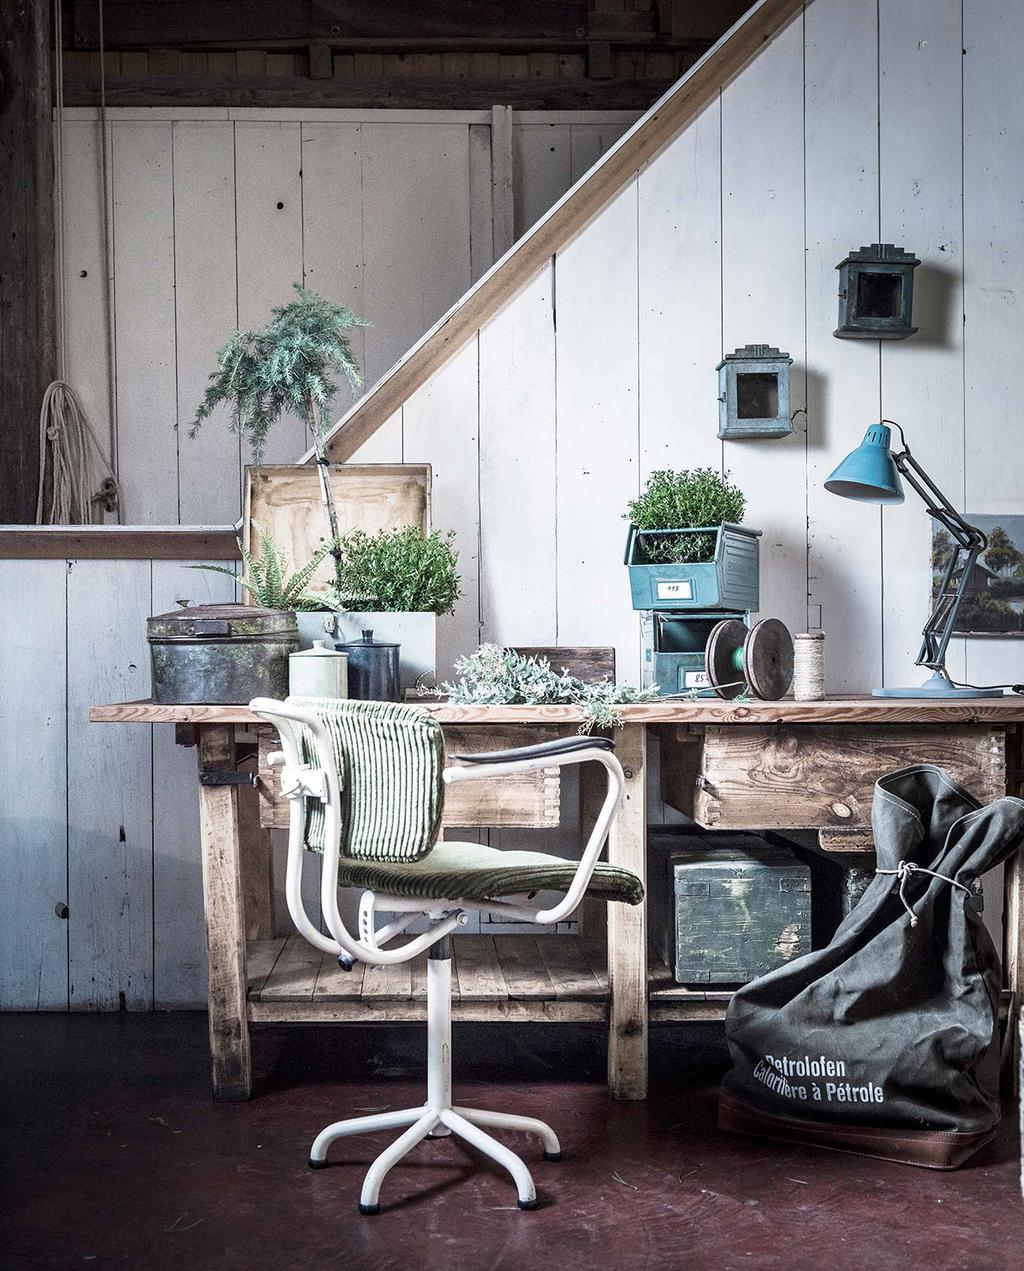 vtwonen 03-2017 | barn brunch ingerichte kamer met houten werkbank en stoel